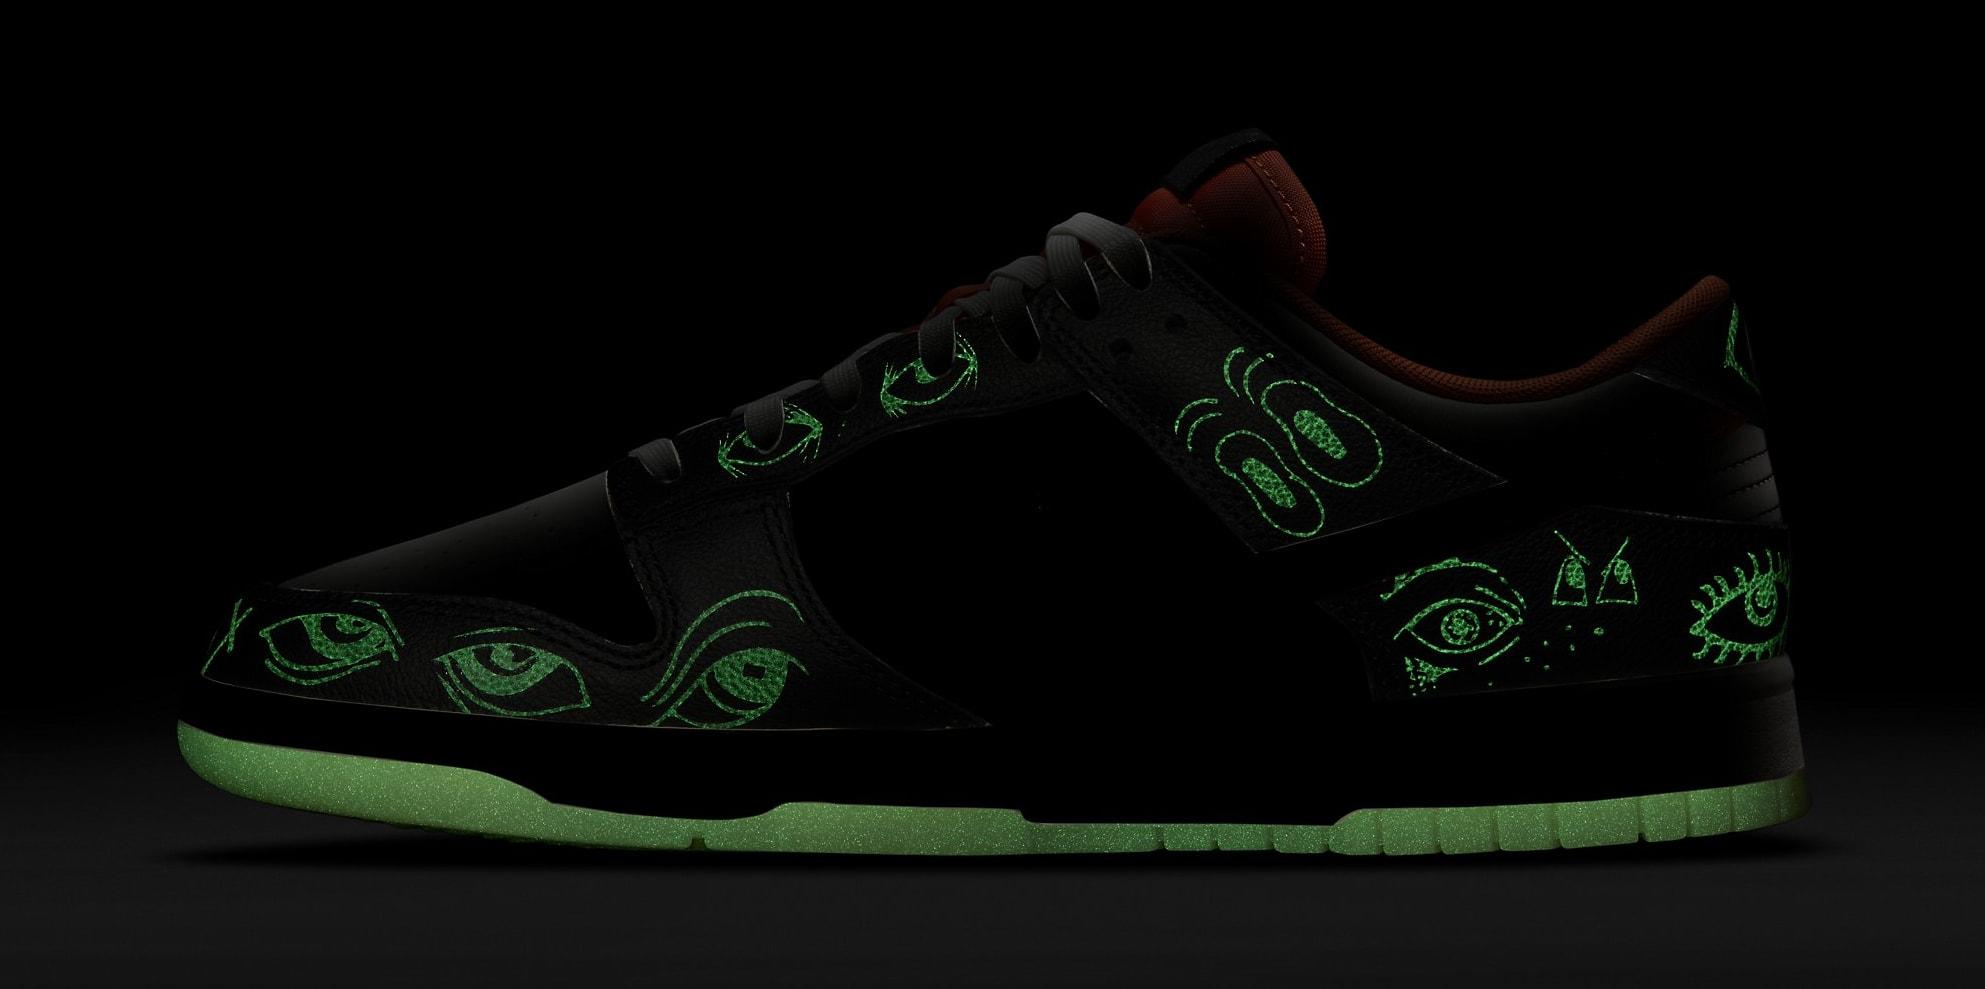 Nike Dunk Low 'Halloween' DD0357-100 Glow-in-the-Dark